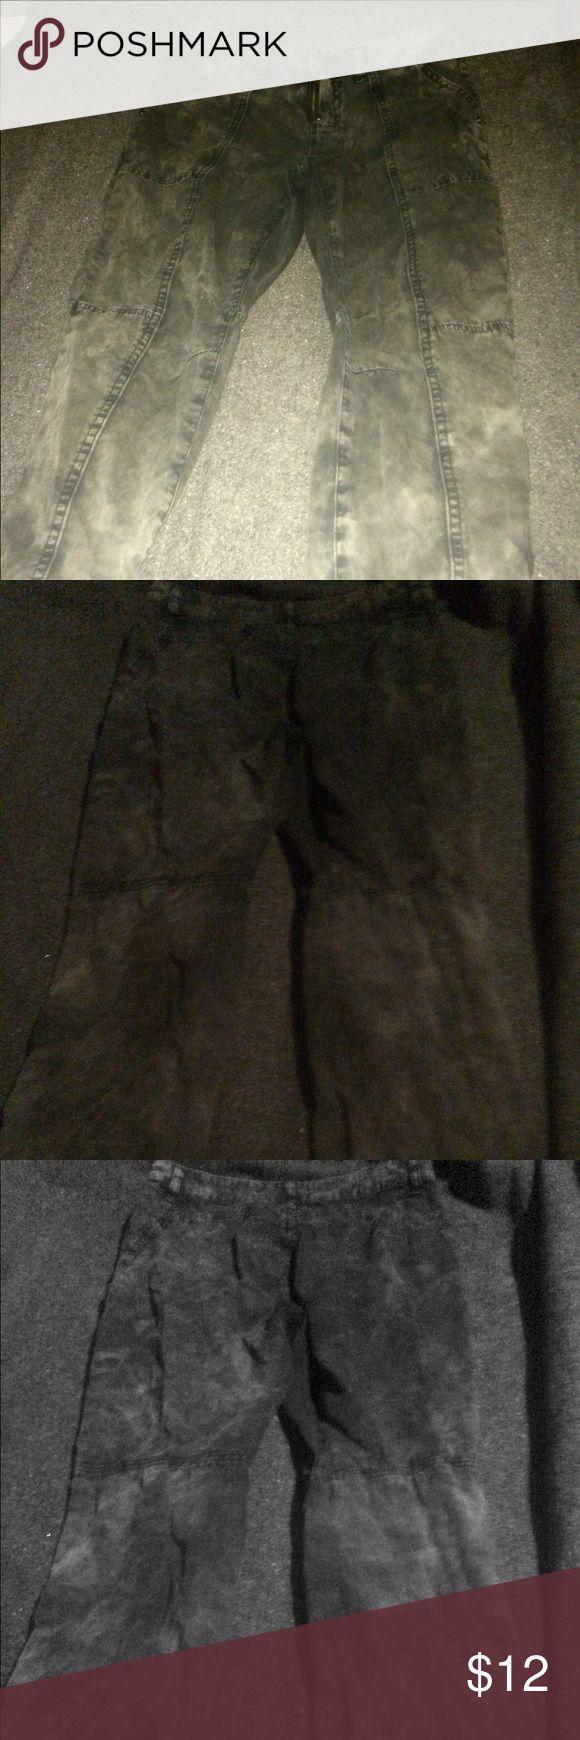 Skinny Black and Grey Camo skinny jeans Brand new without tag. Black and grey camo pants. Skinny jeans. Super cute. Forever 21 Jeans Skinny